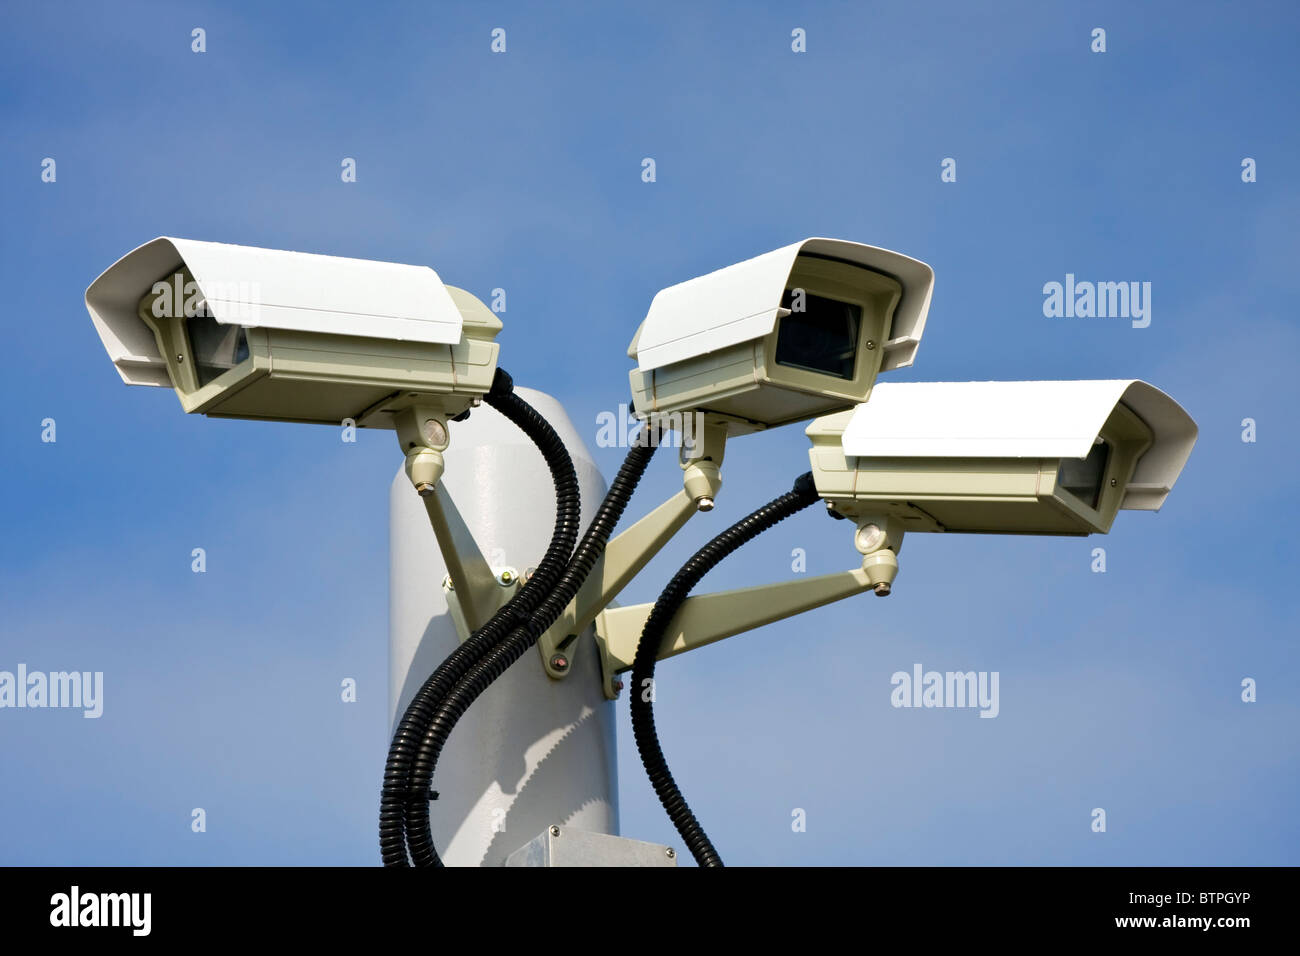 Security surveillance camera - Stock Image